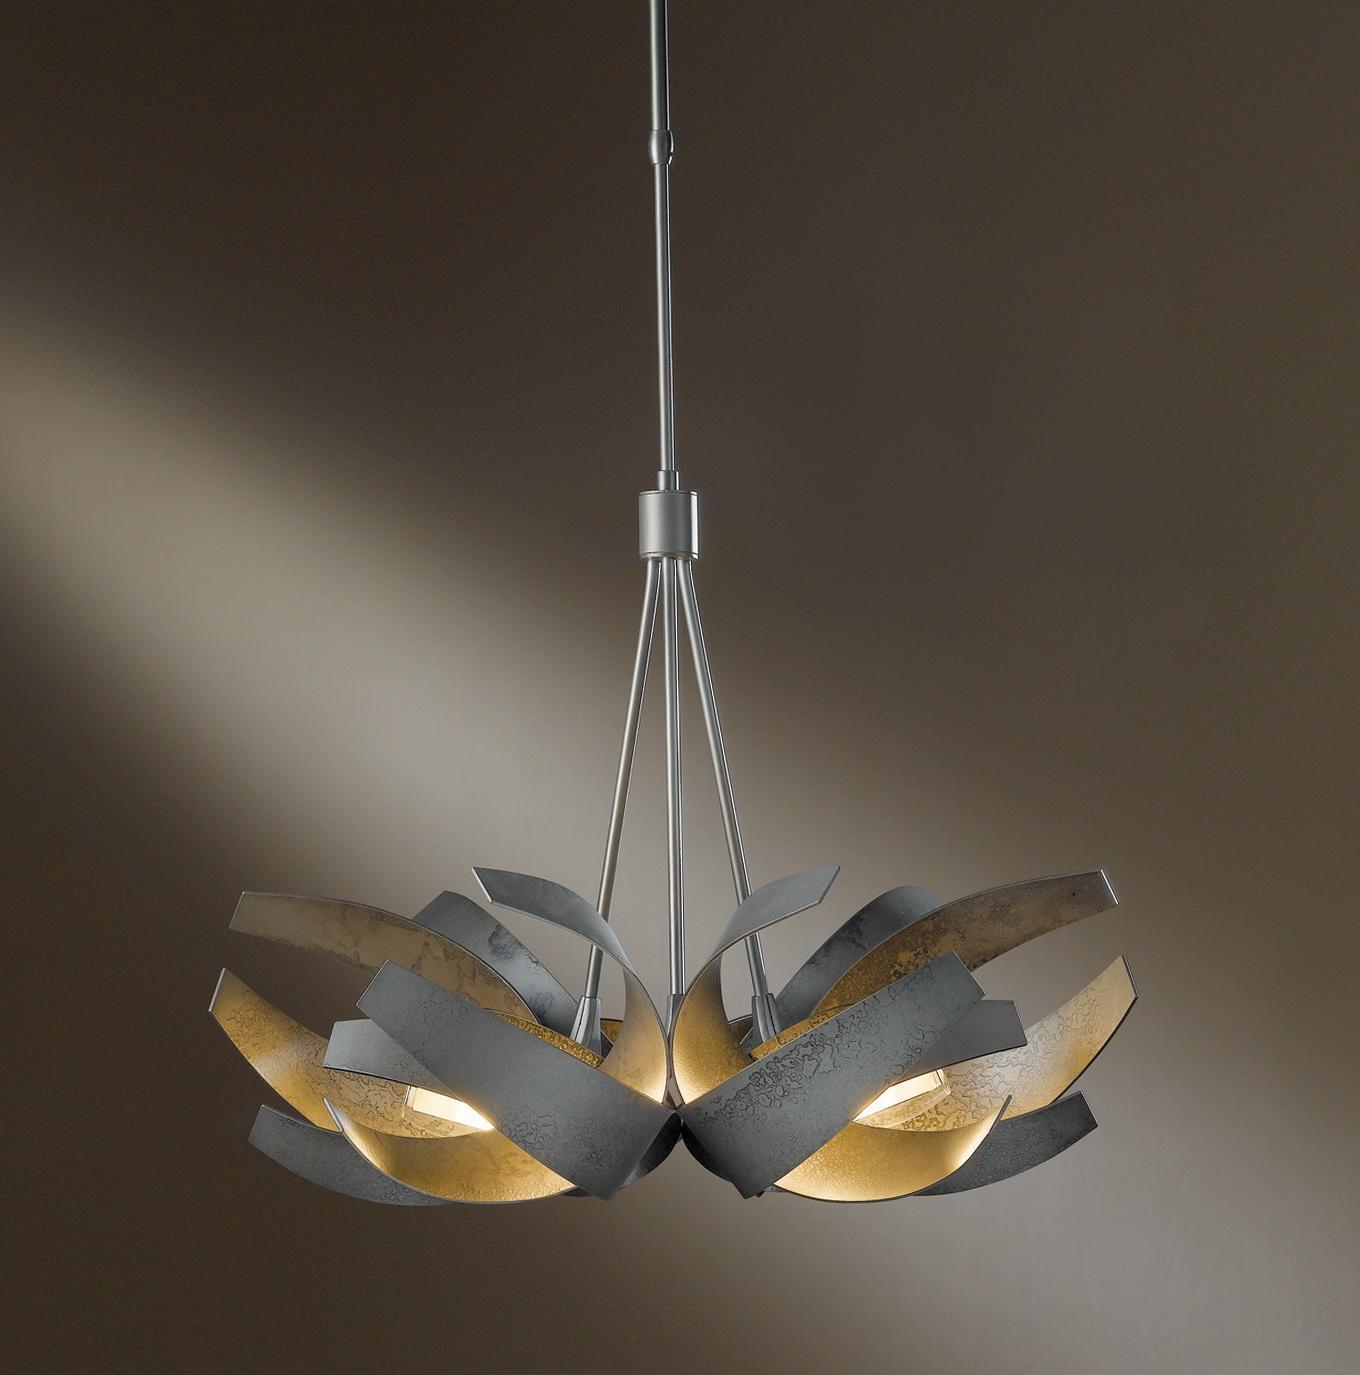 Hubbardton forge corona chandelier home design ideas hubbardton forge corona chandelier arubaitofo Image collections